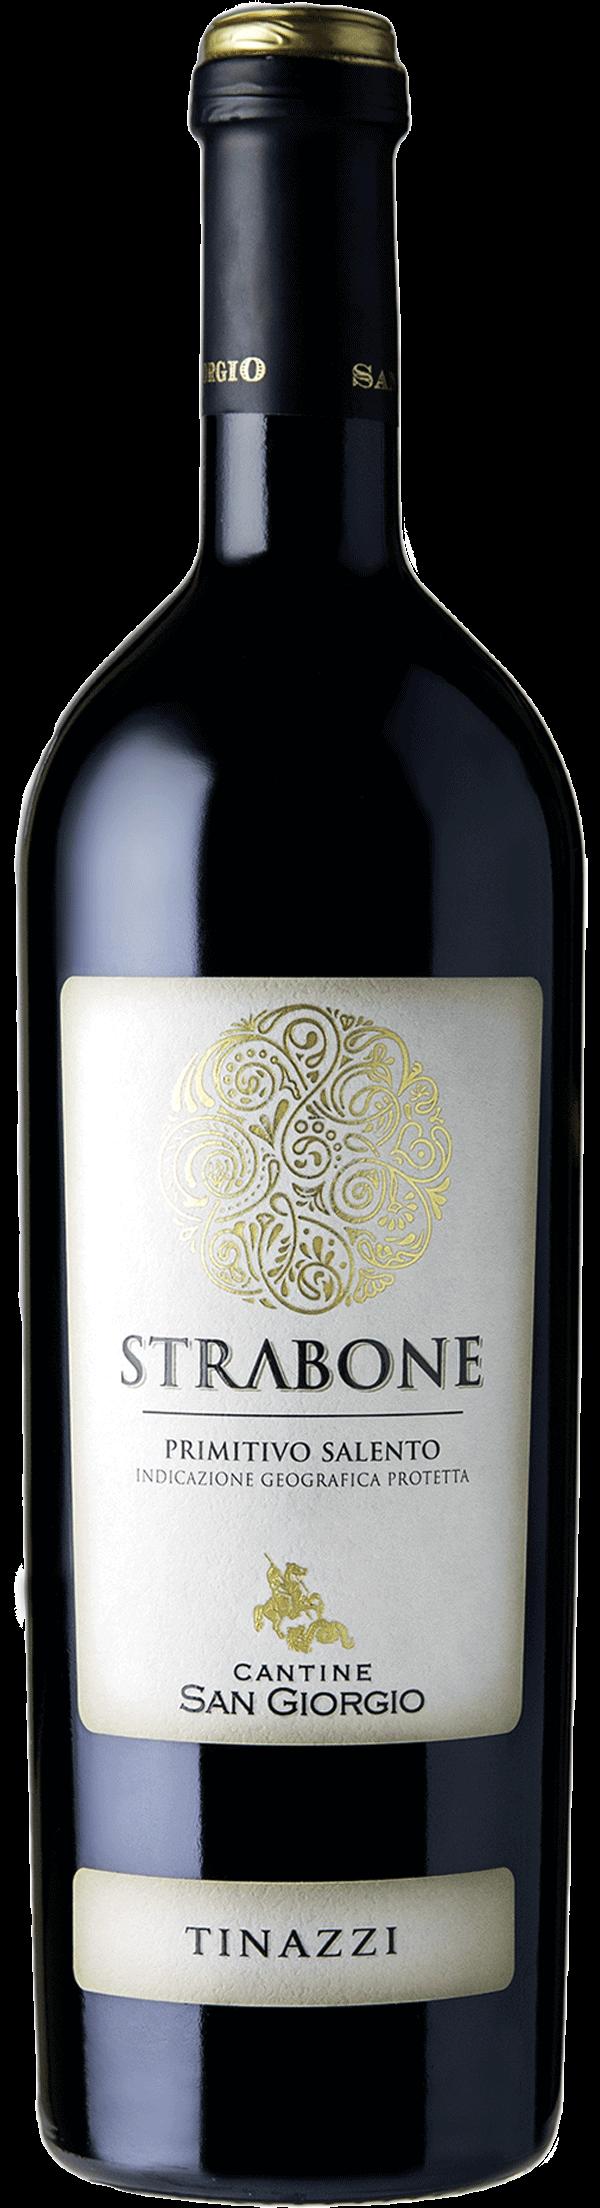 Strabone